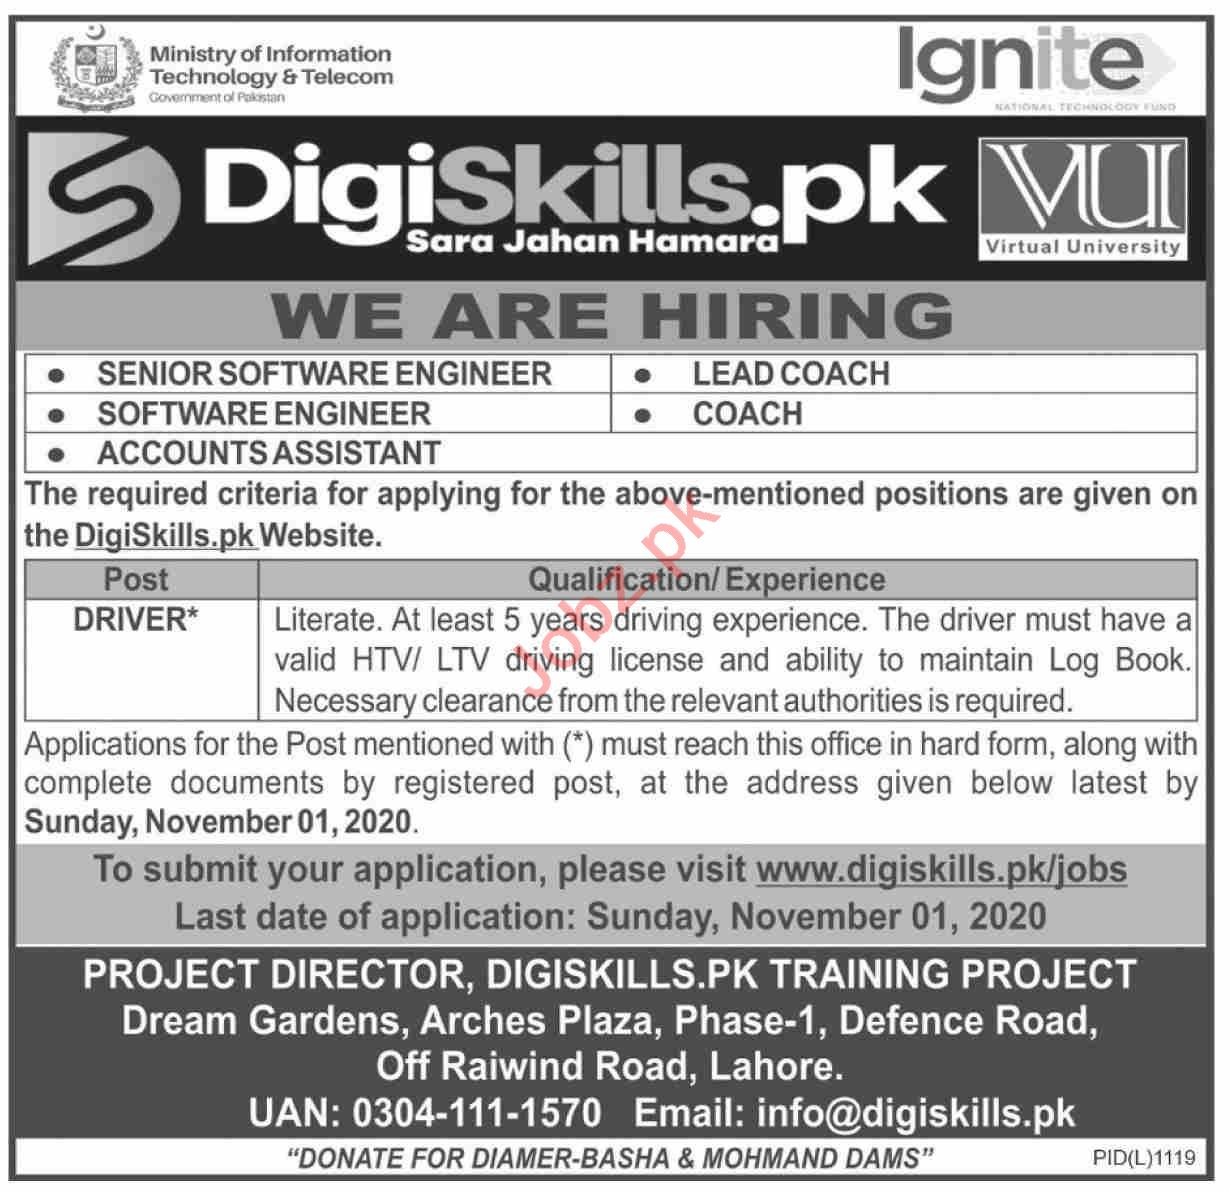 Virtual University of Pakistan VU Jobs 2020 for Engineer